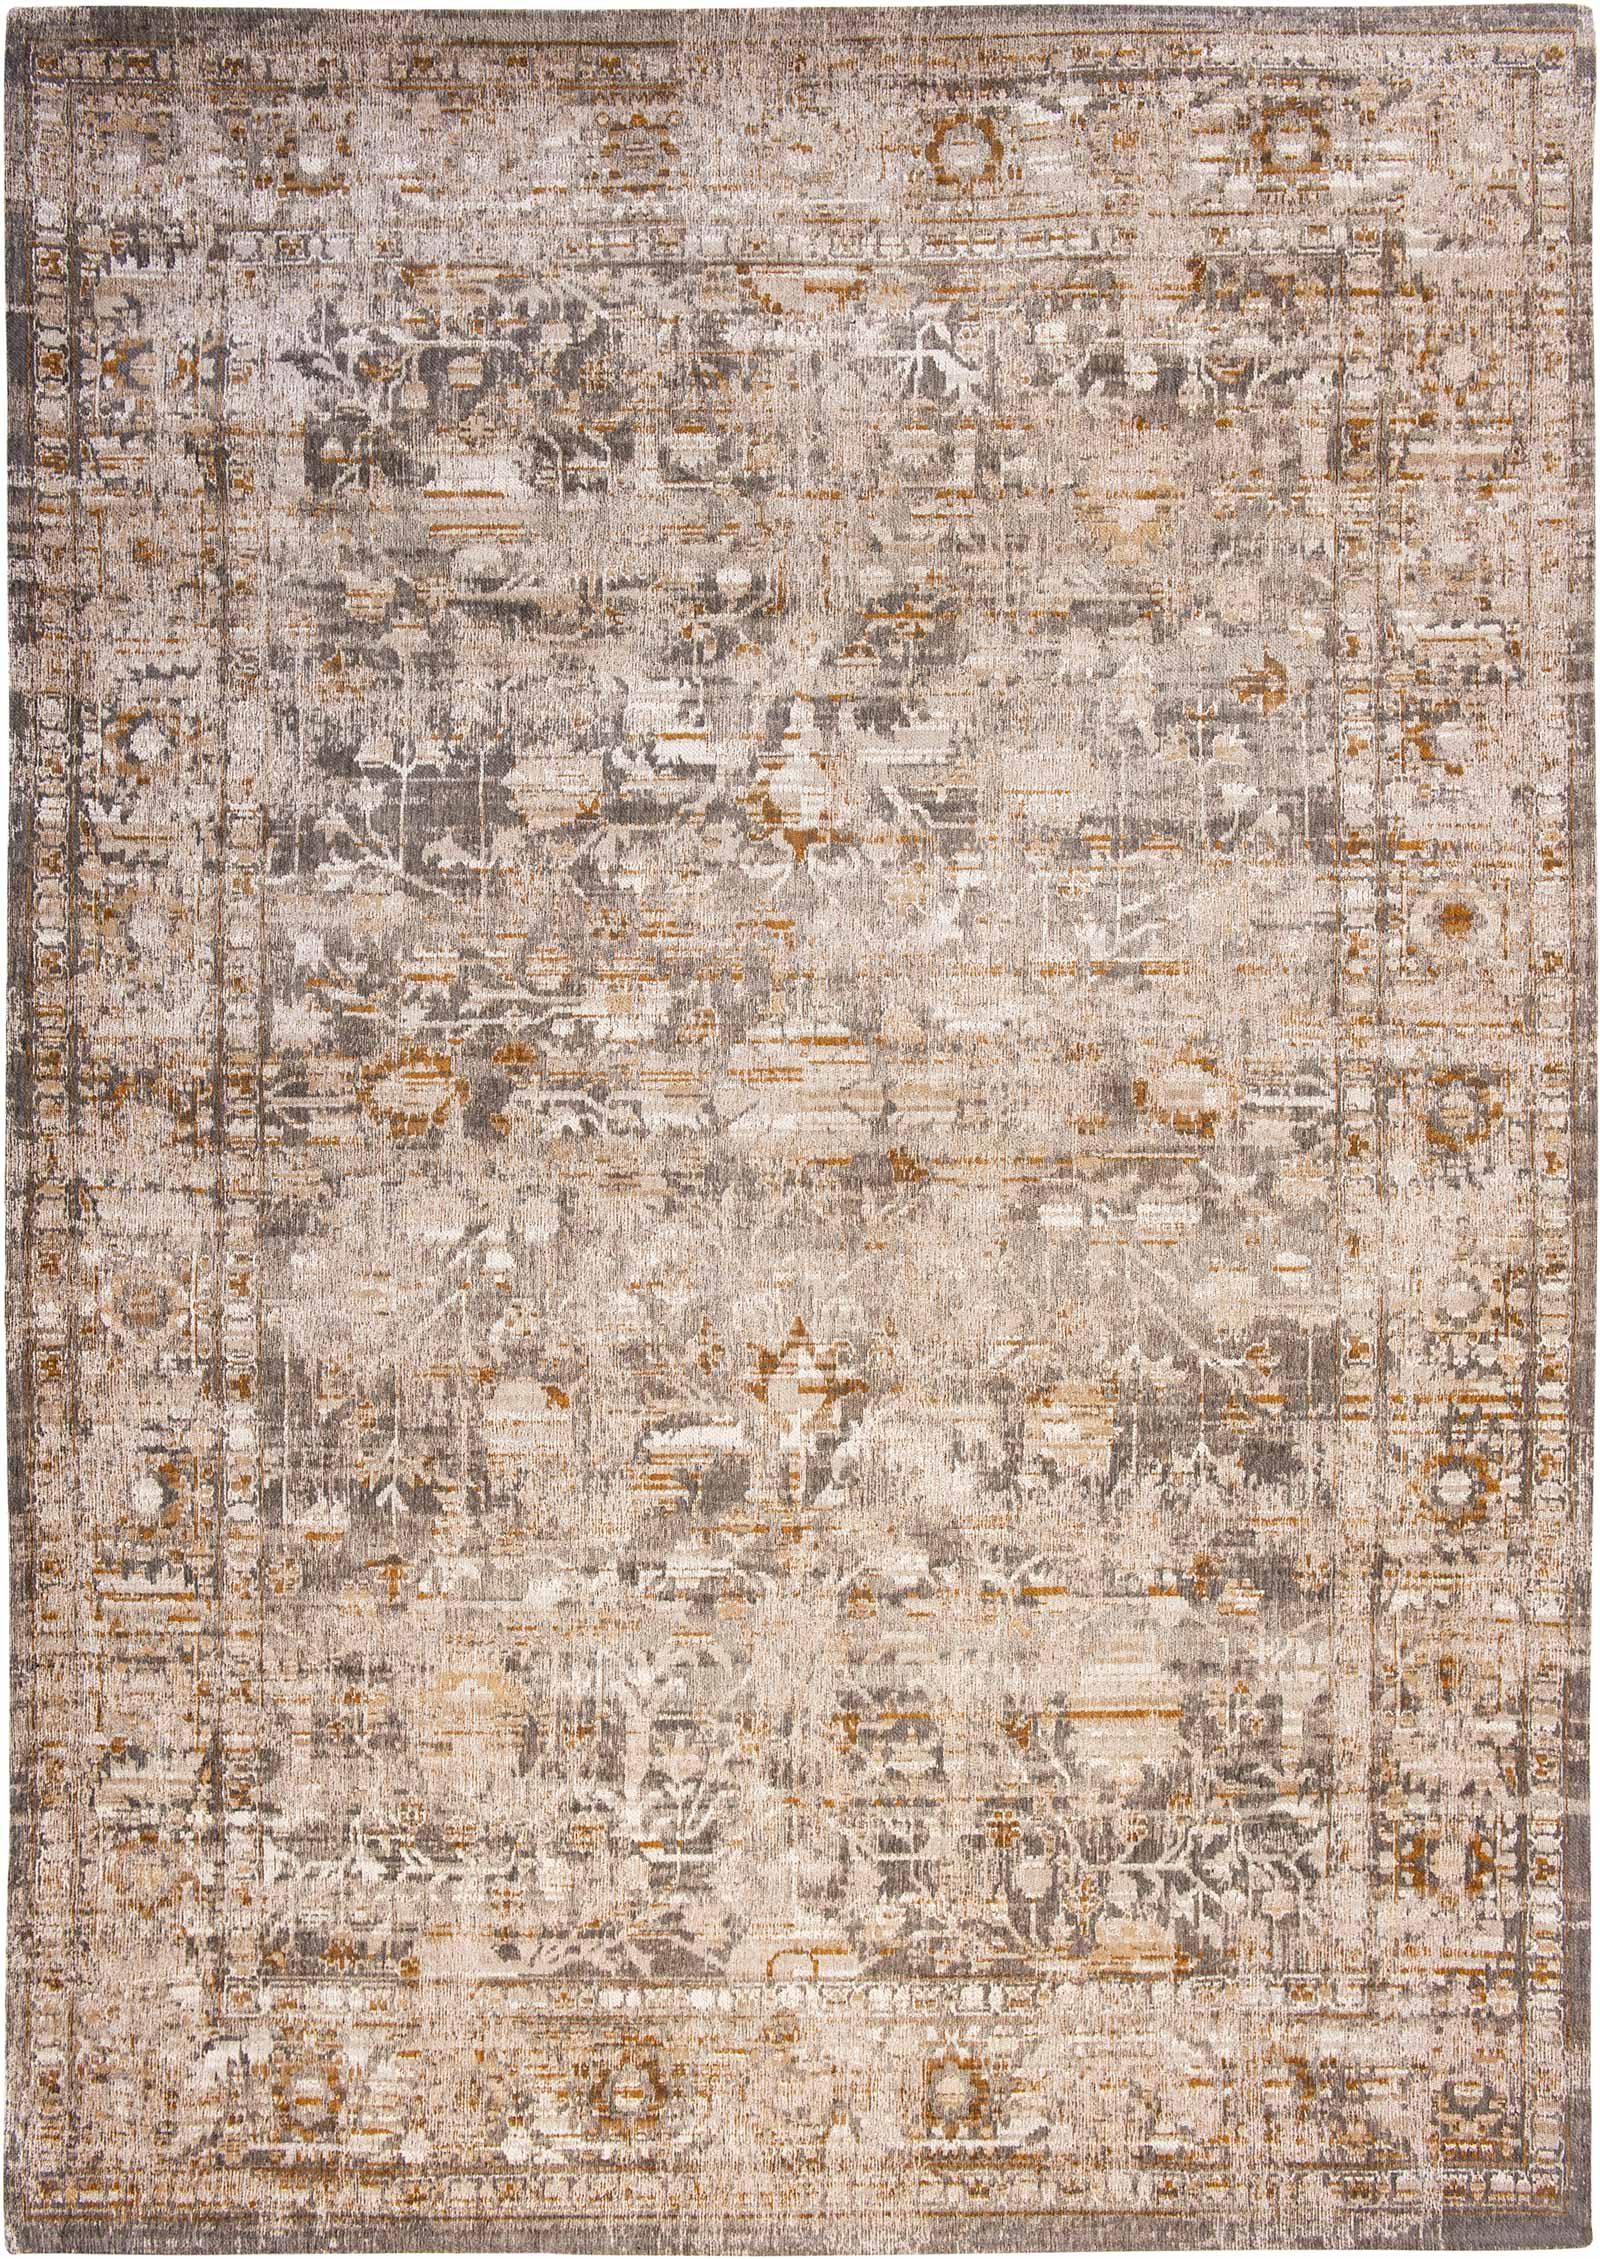 Louis De Poortere rug LX 8884 Antiquarian Ushak Suleiman Grey